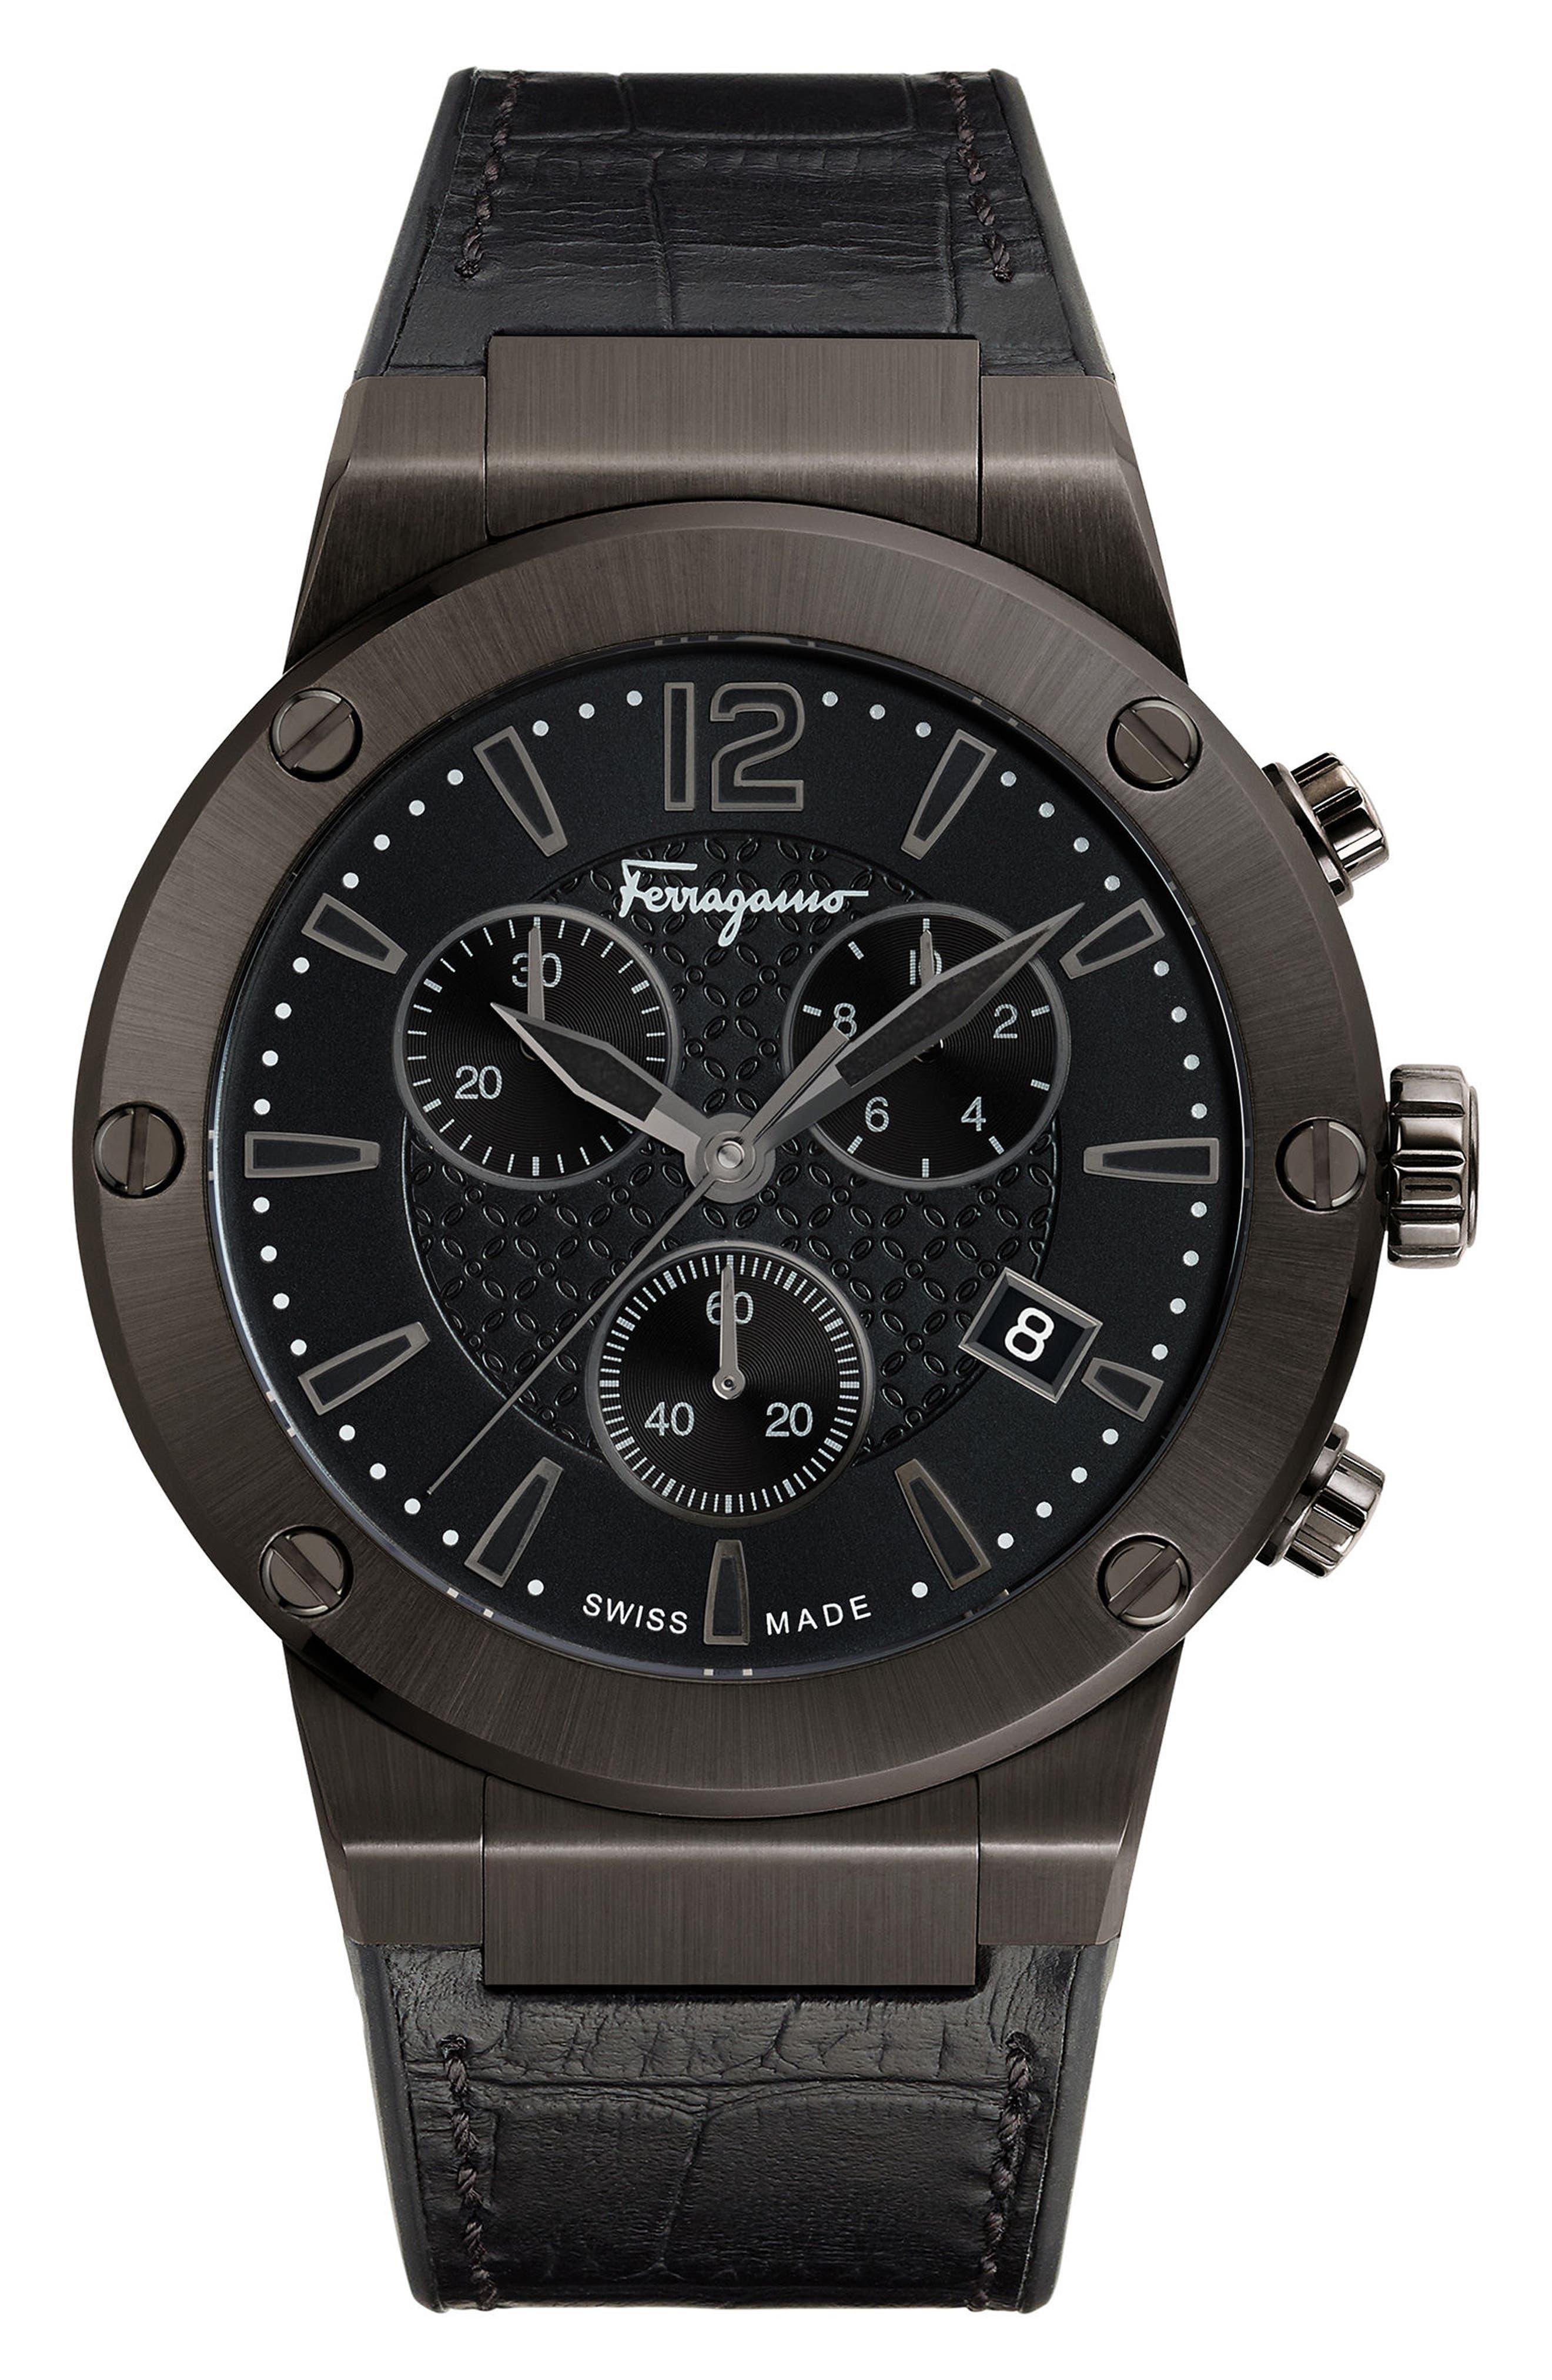 SALVATORE FERRAGAMO F80 Chronograph Leather Strap Watch, 44mm, Main, color, GUNMETAL/ BLACK/ GUNMETAL